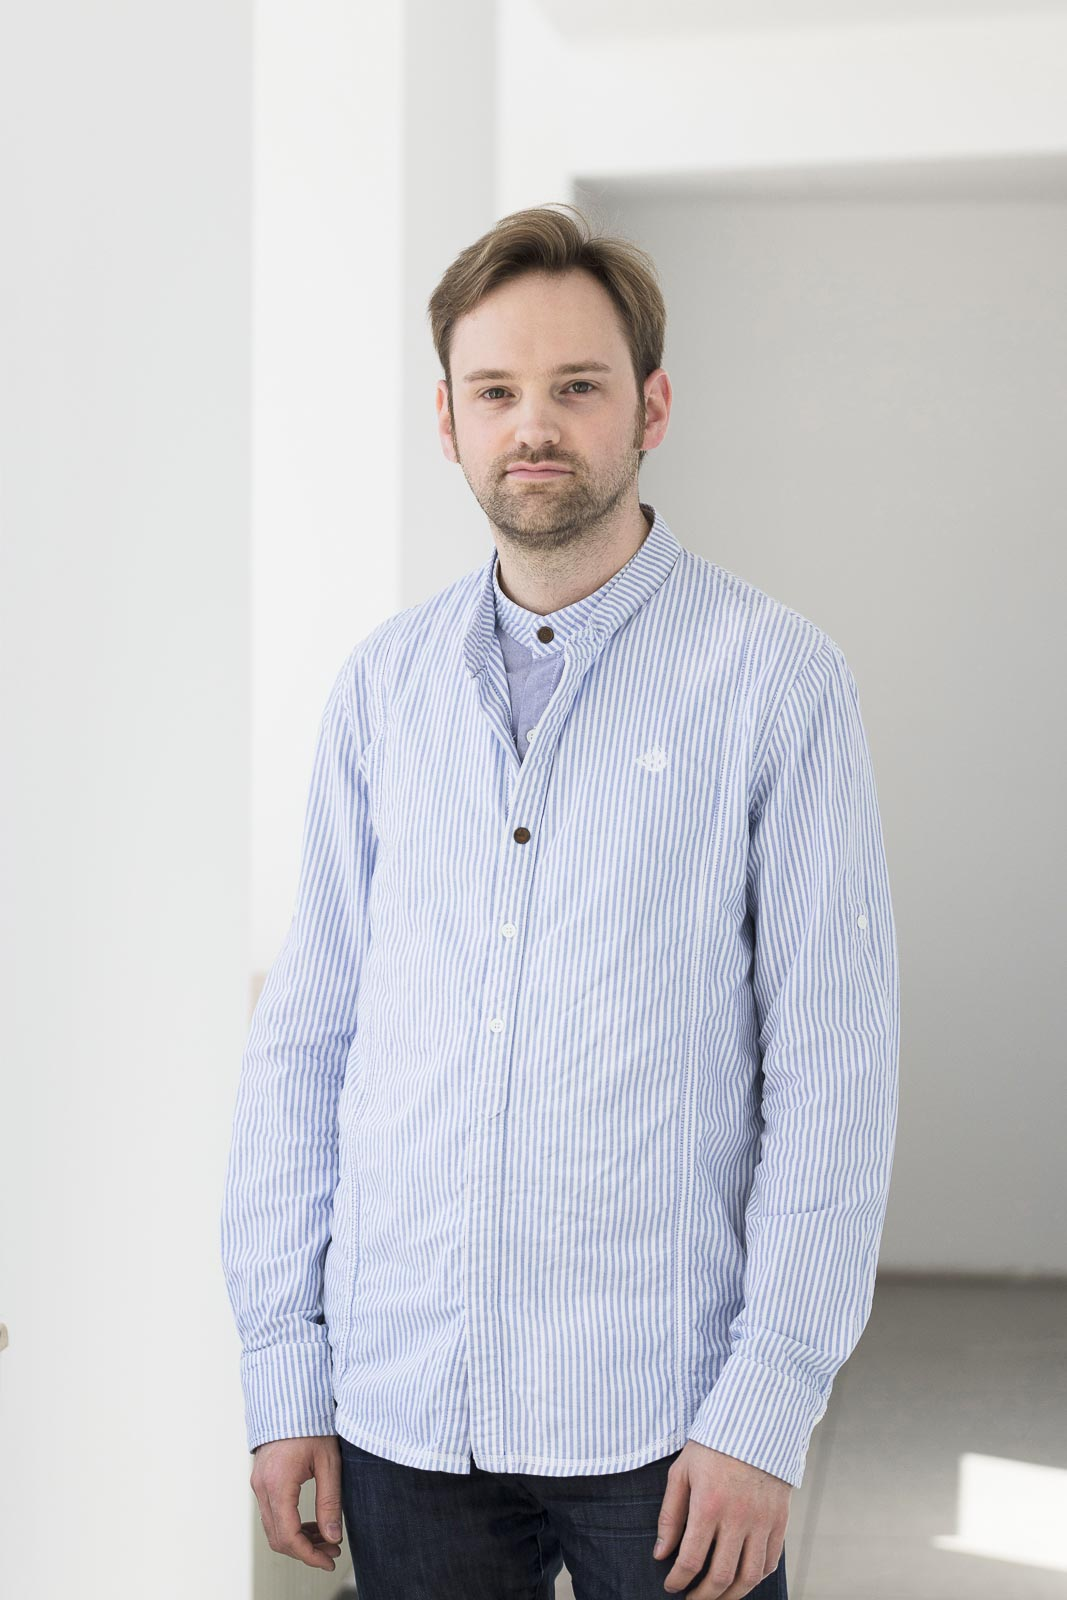 Jens Kloster